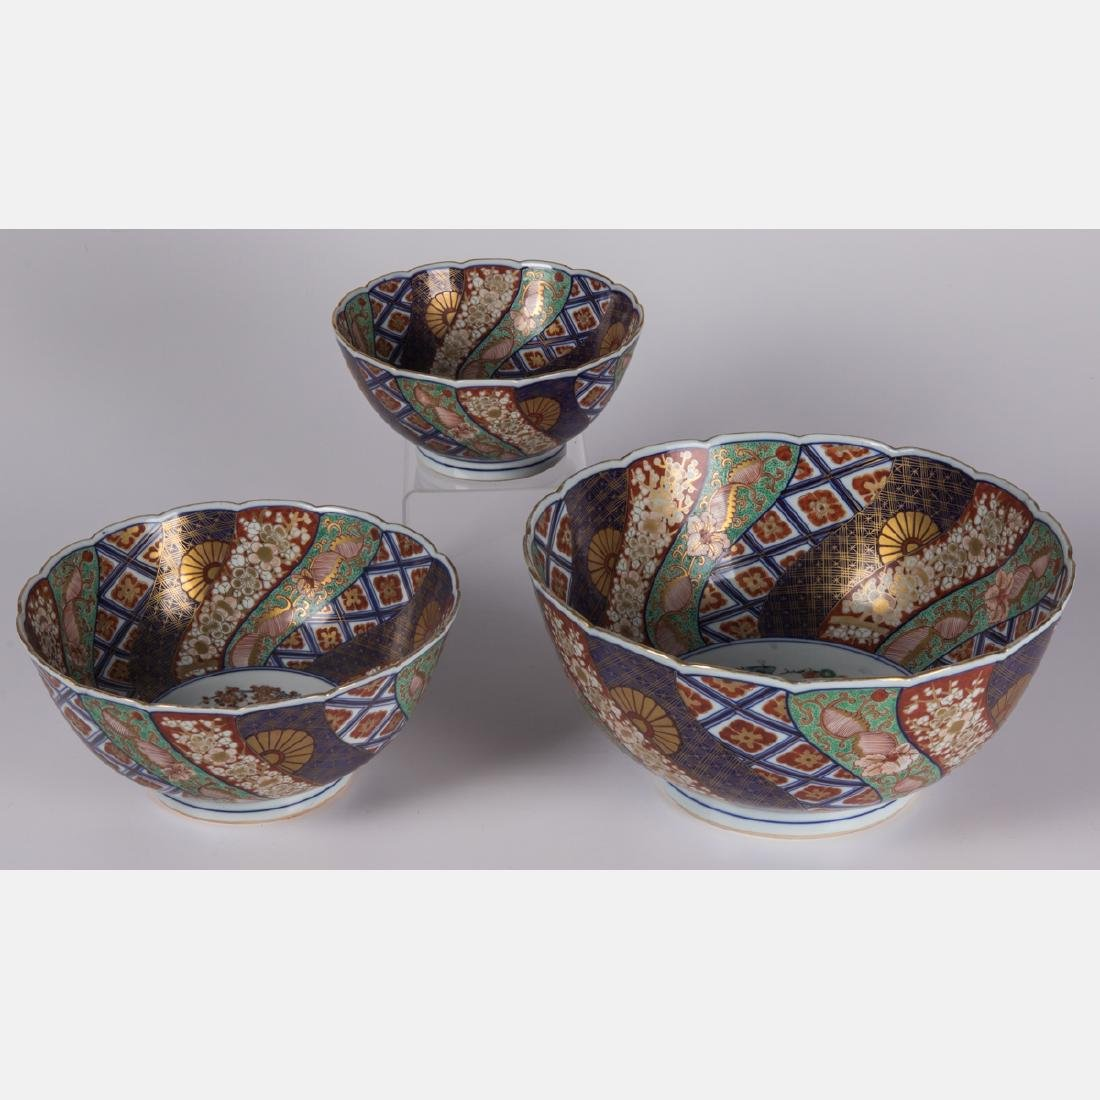 A Collection of Three Japanese Imari Bowls, 20th